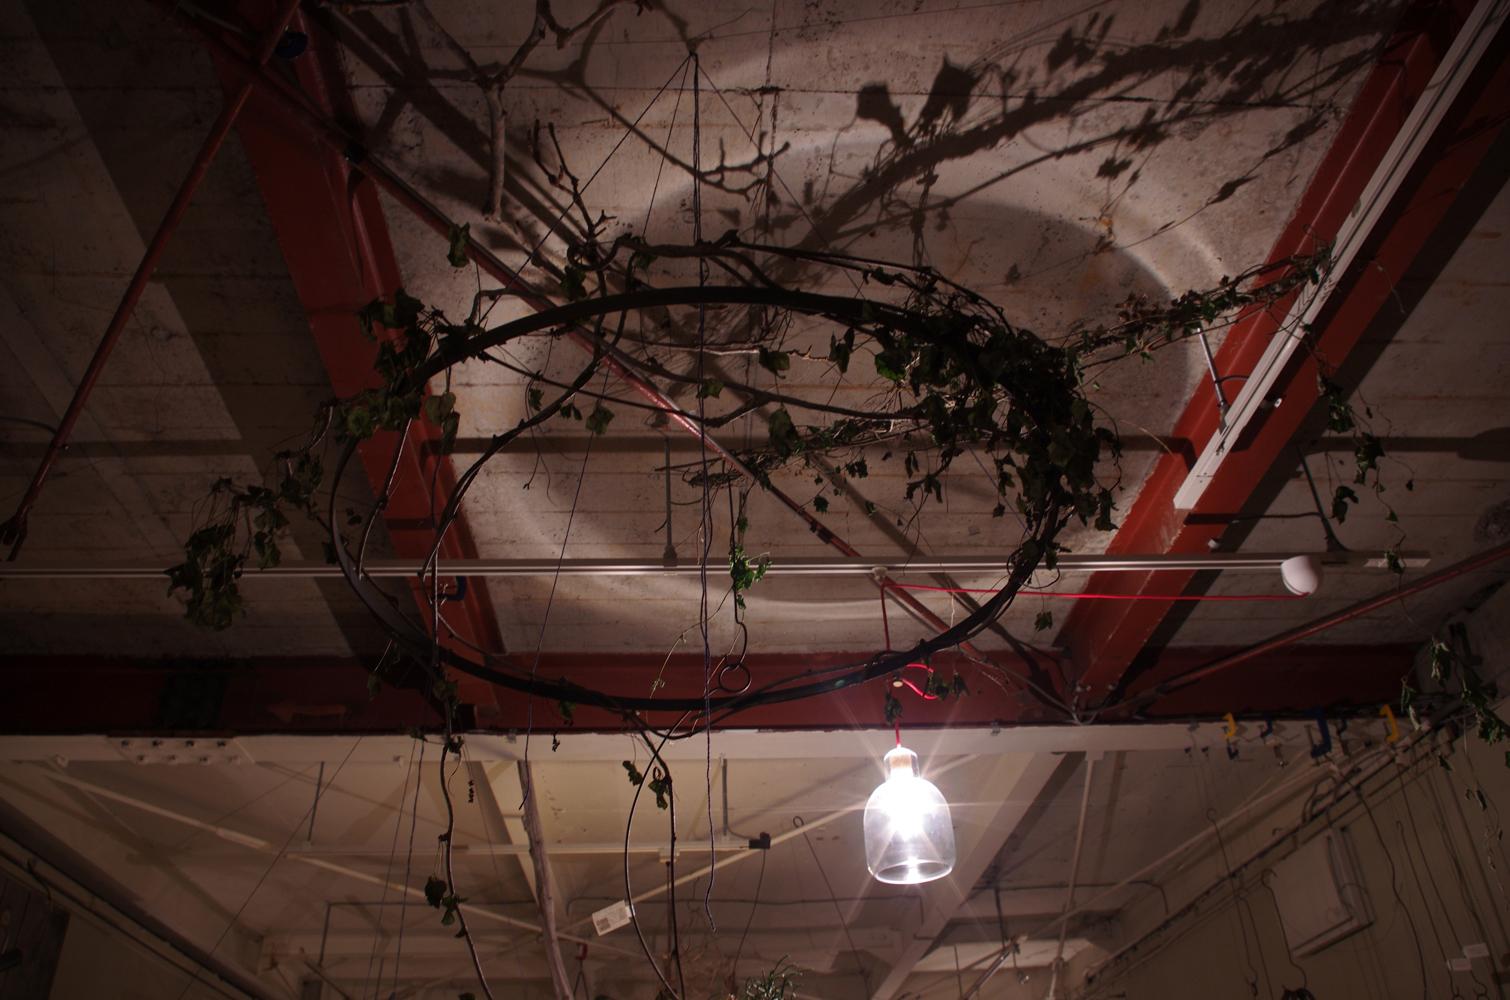 tipura-studio-ironworks-exhibition-9